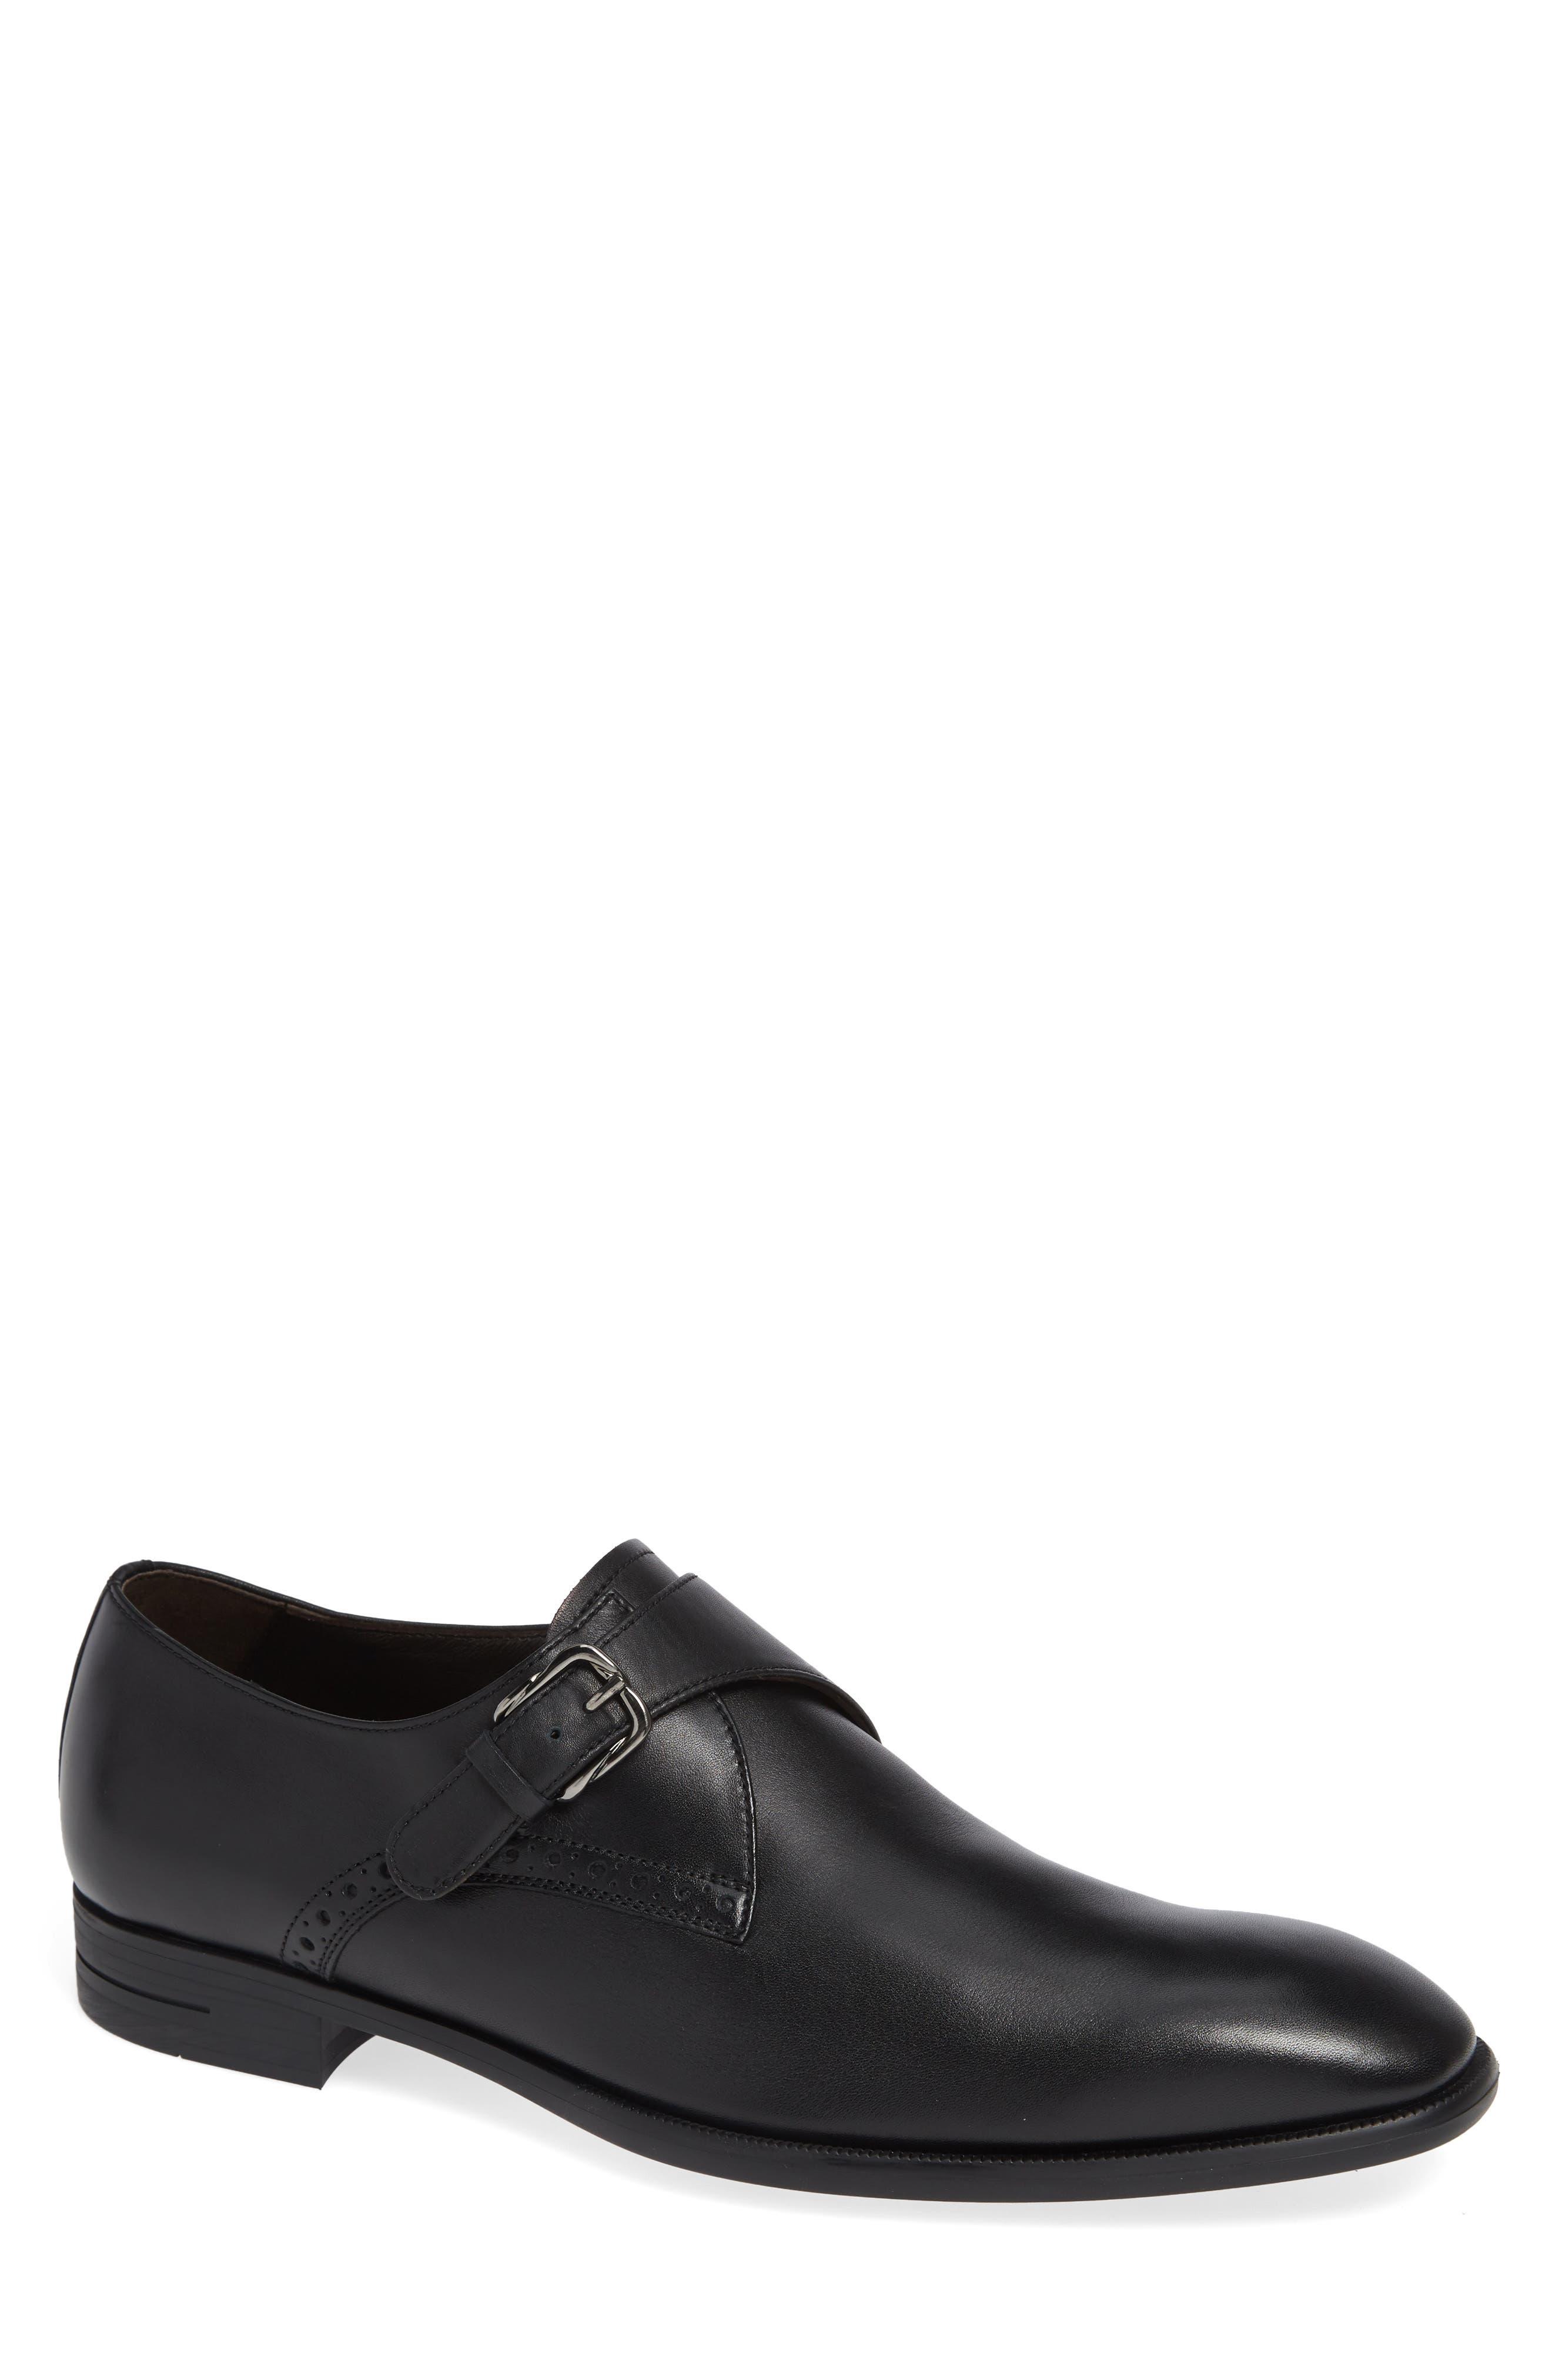 ERMENEGILDO ZEGNA, Single Strap Monk Shoe, Main thumbnail 1, color, BLACK